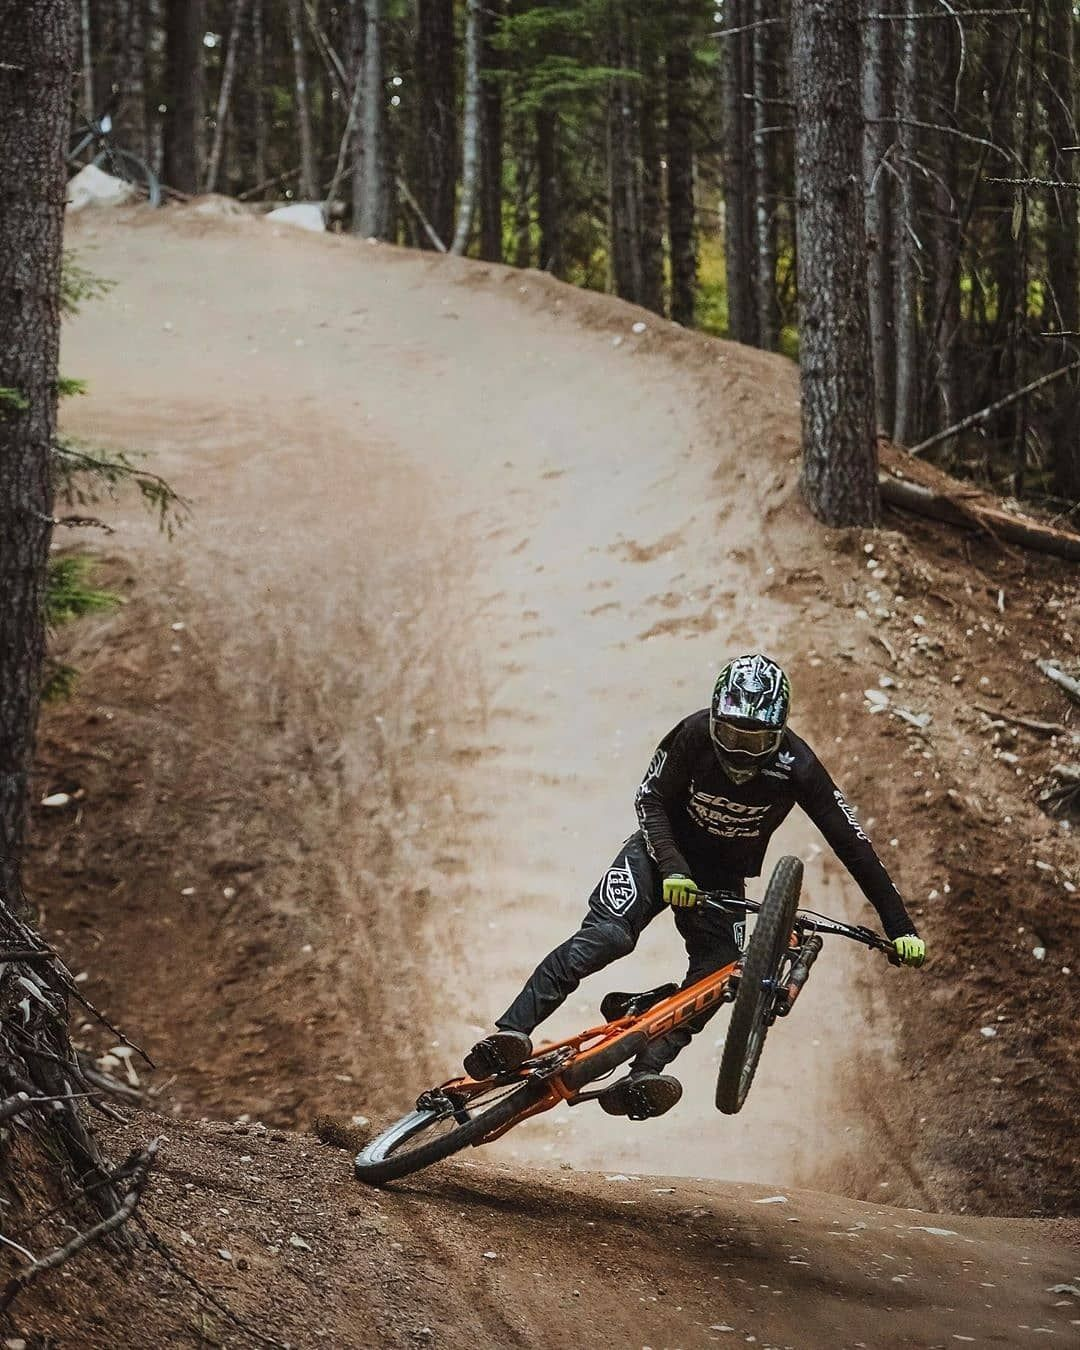 Brendog1 Do You Have Cool Photo Tag Photo Whip Bike In 2020 Mtb Bike Mountain Downhill Mountain Biking Mountain Bike Action